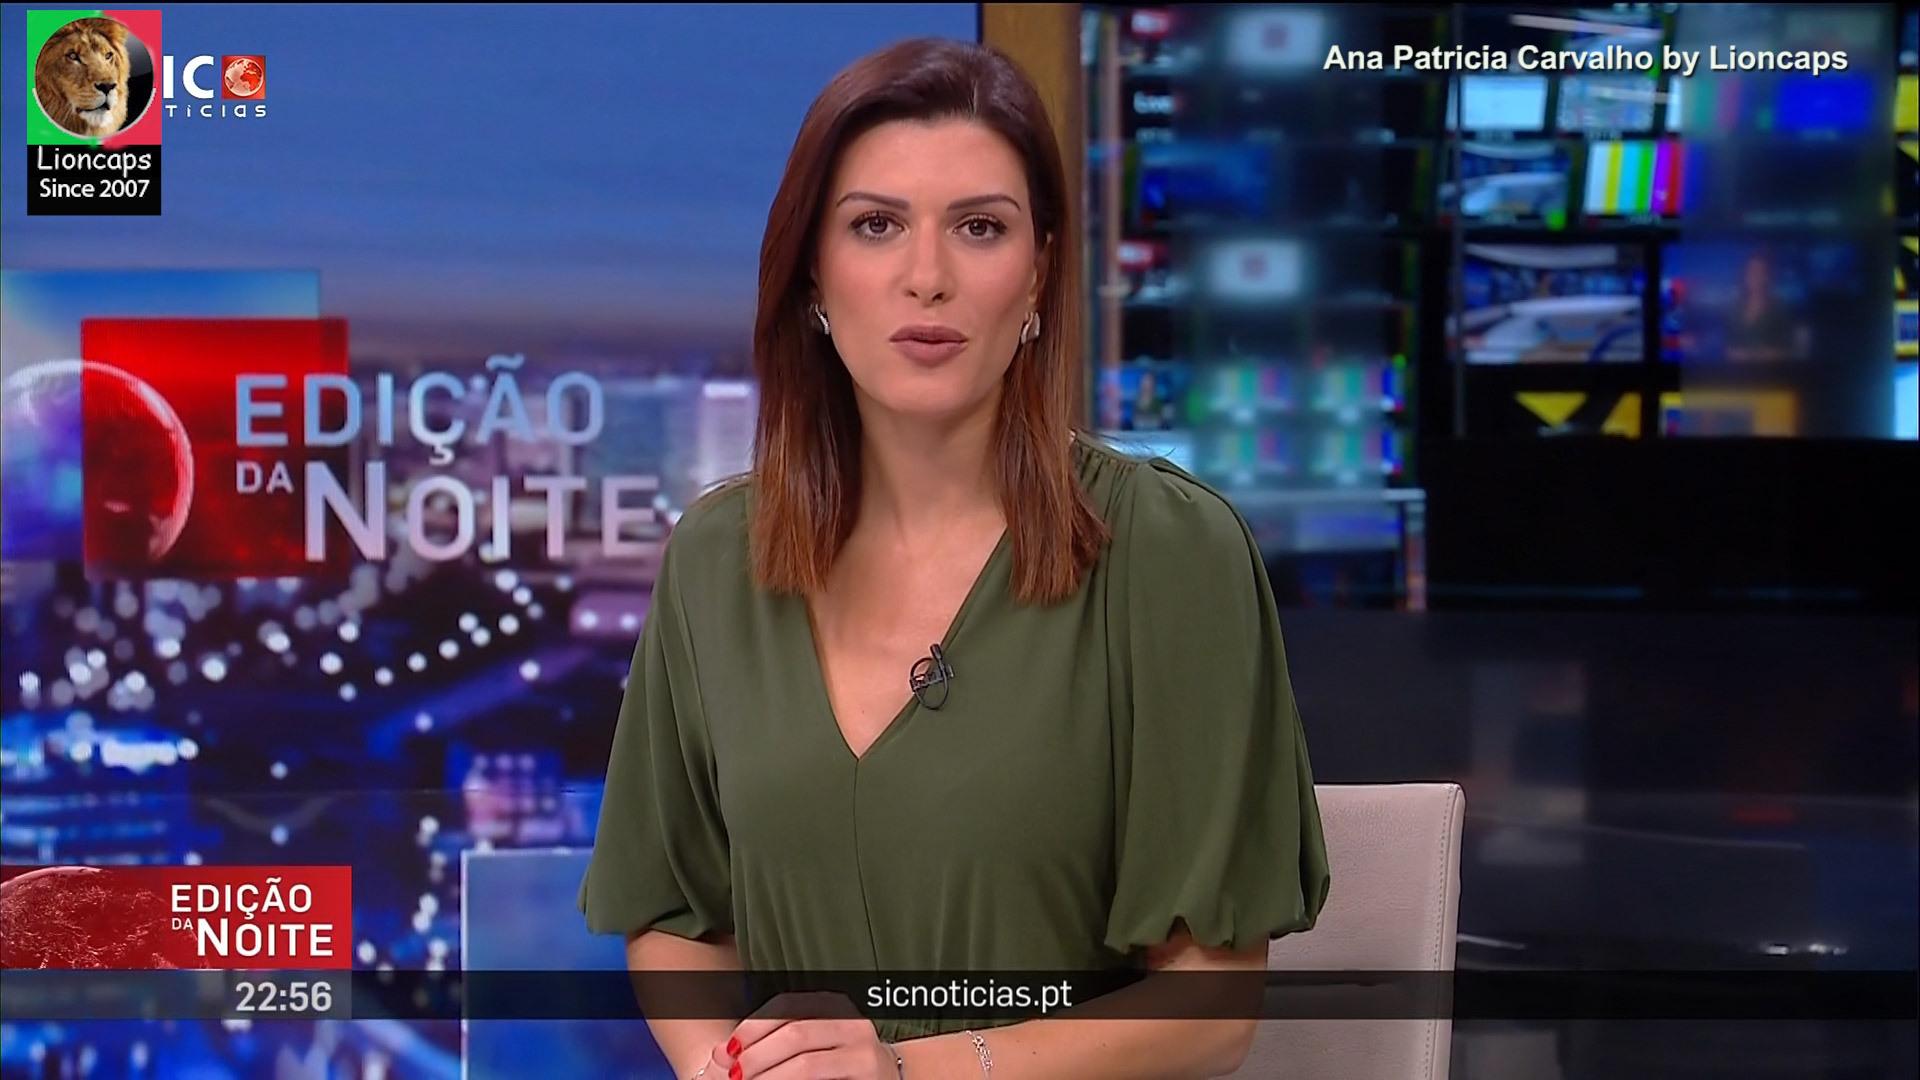 ana_patricia_carvalho_sicn_lioncaps_30_05_2021 (8).jpg